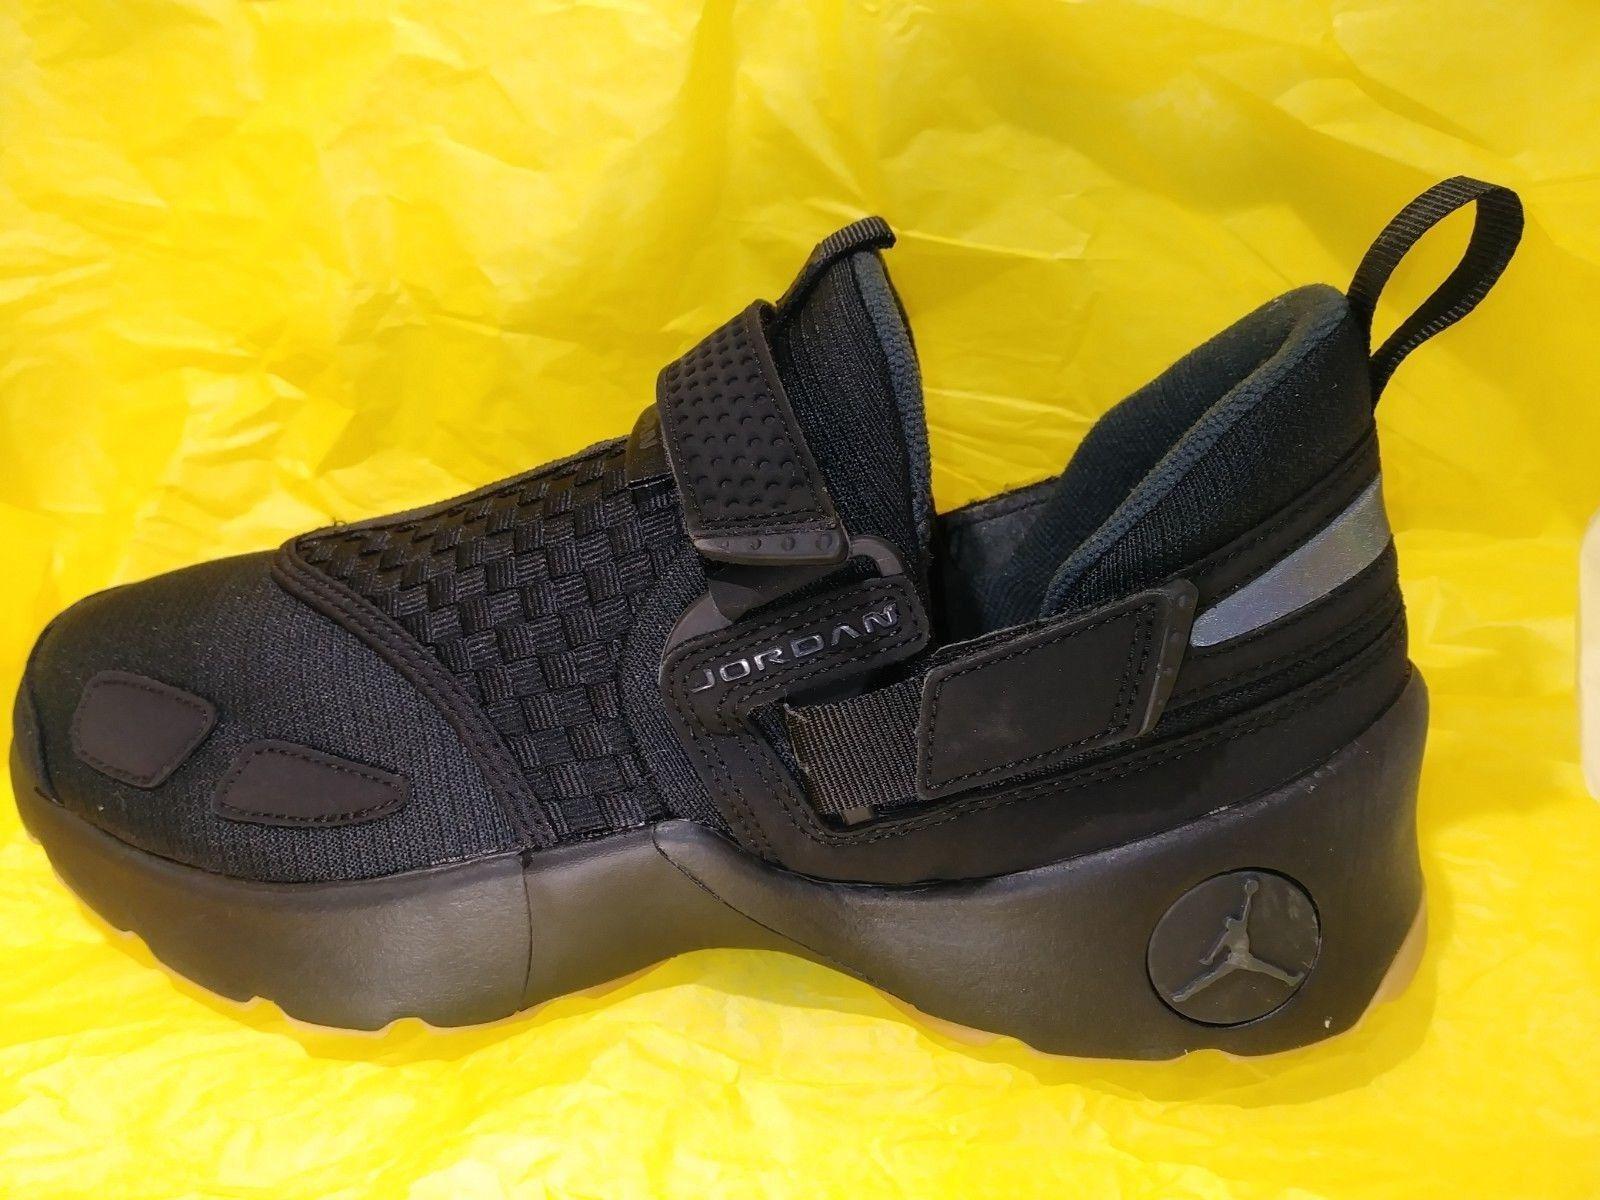 Nike JORDAN TRUNNER LX Black Anthracite Gum Yellow 897992-021 RETAIL  120 SZ 9.5